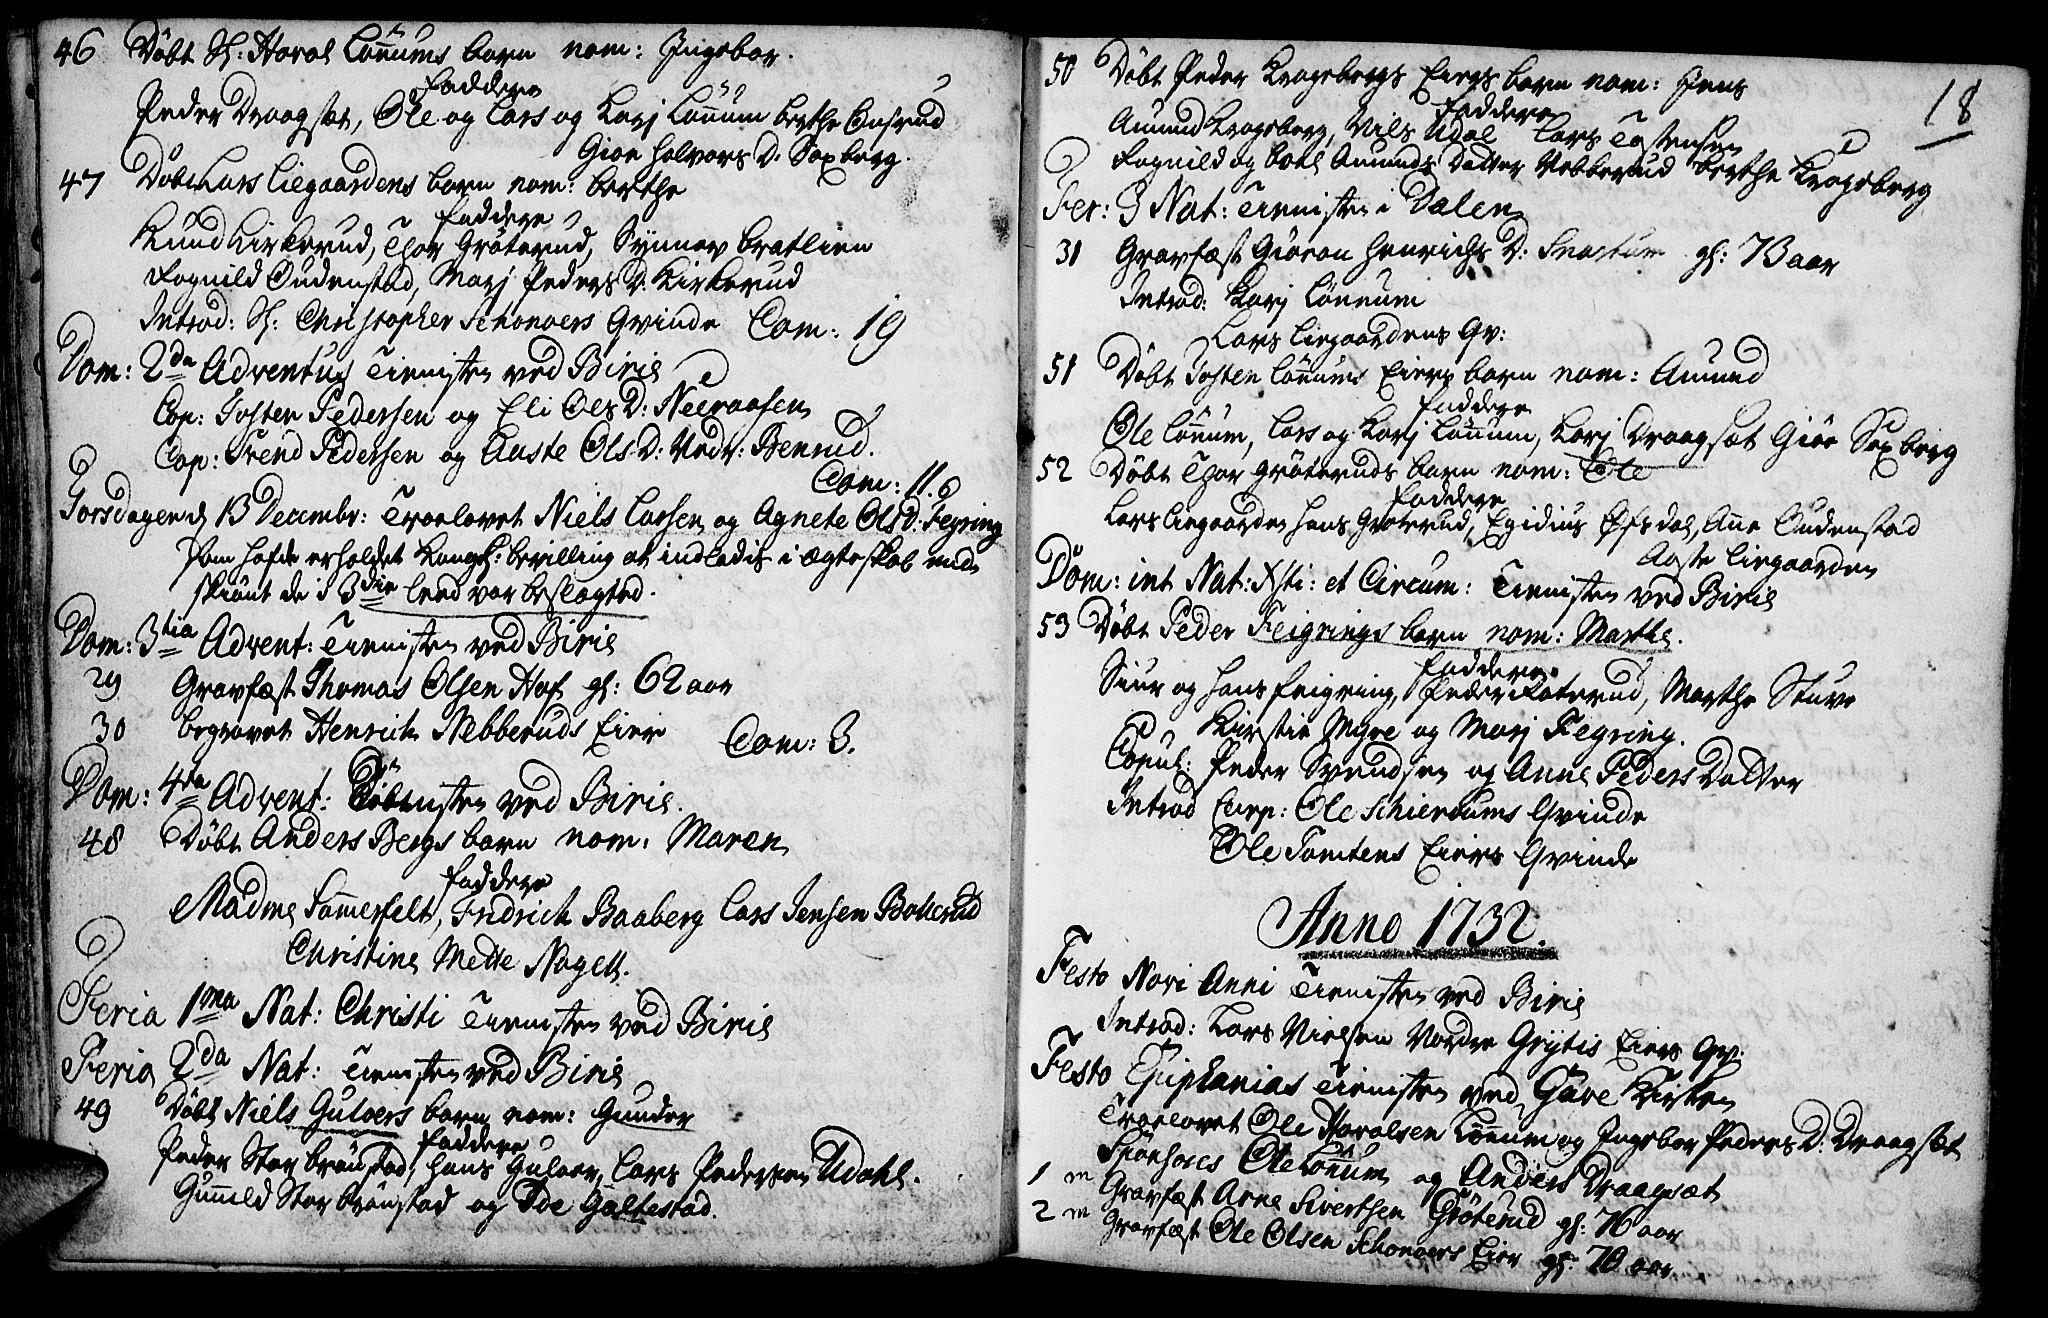 SAH, Biri prestekontor, Ministerialbok nr. 1, 1730-1754, s. 18